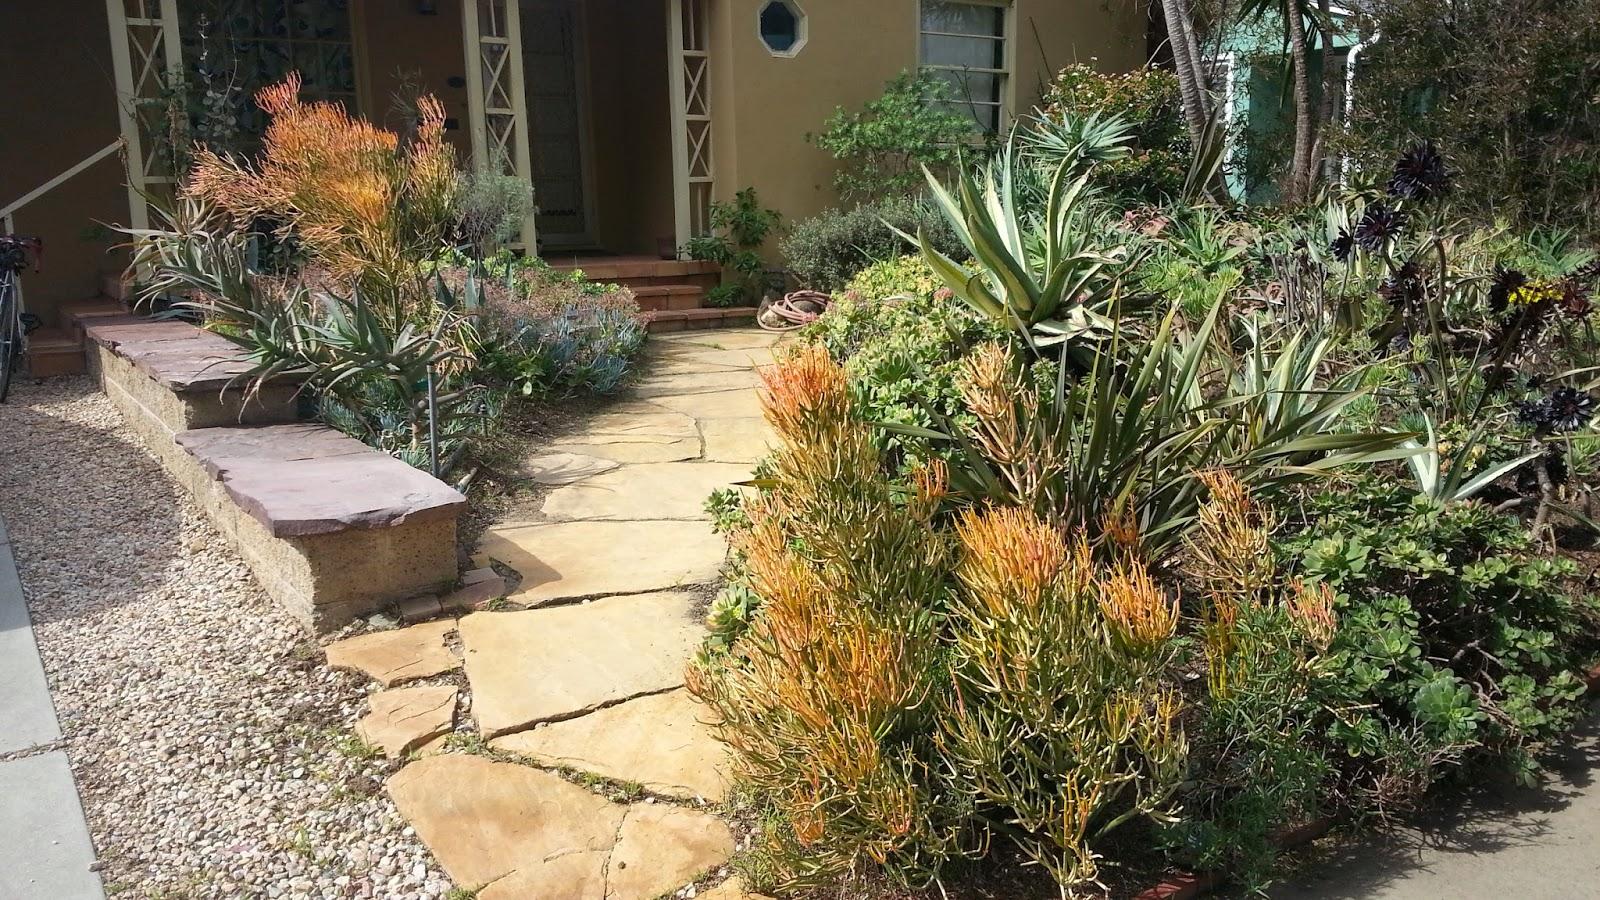 mar vista green garden showcase 3761 ashwood avenue cluster 5c